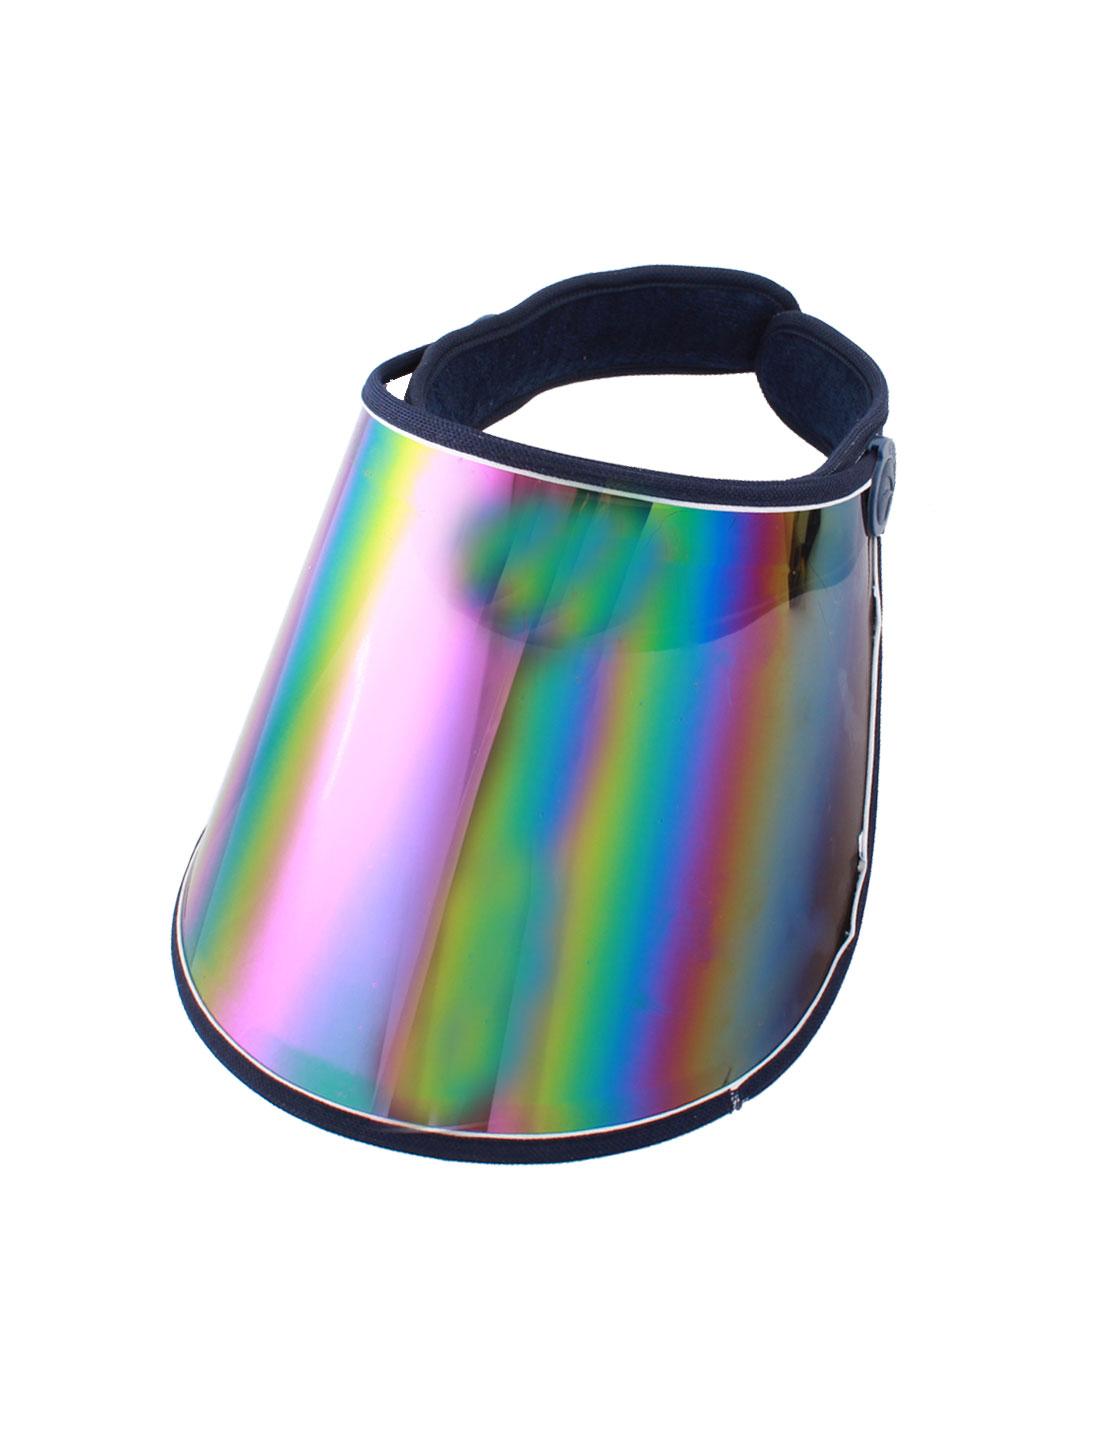 Lady UV Protection Plastic Cover Nylon Brim Sun Visor Cap Hat Dark Blue